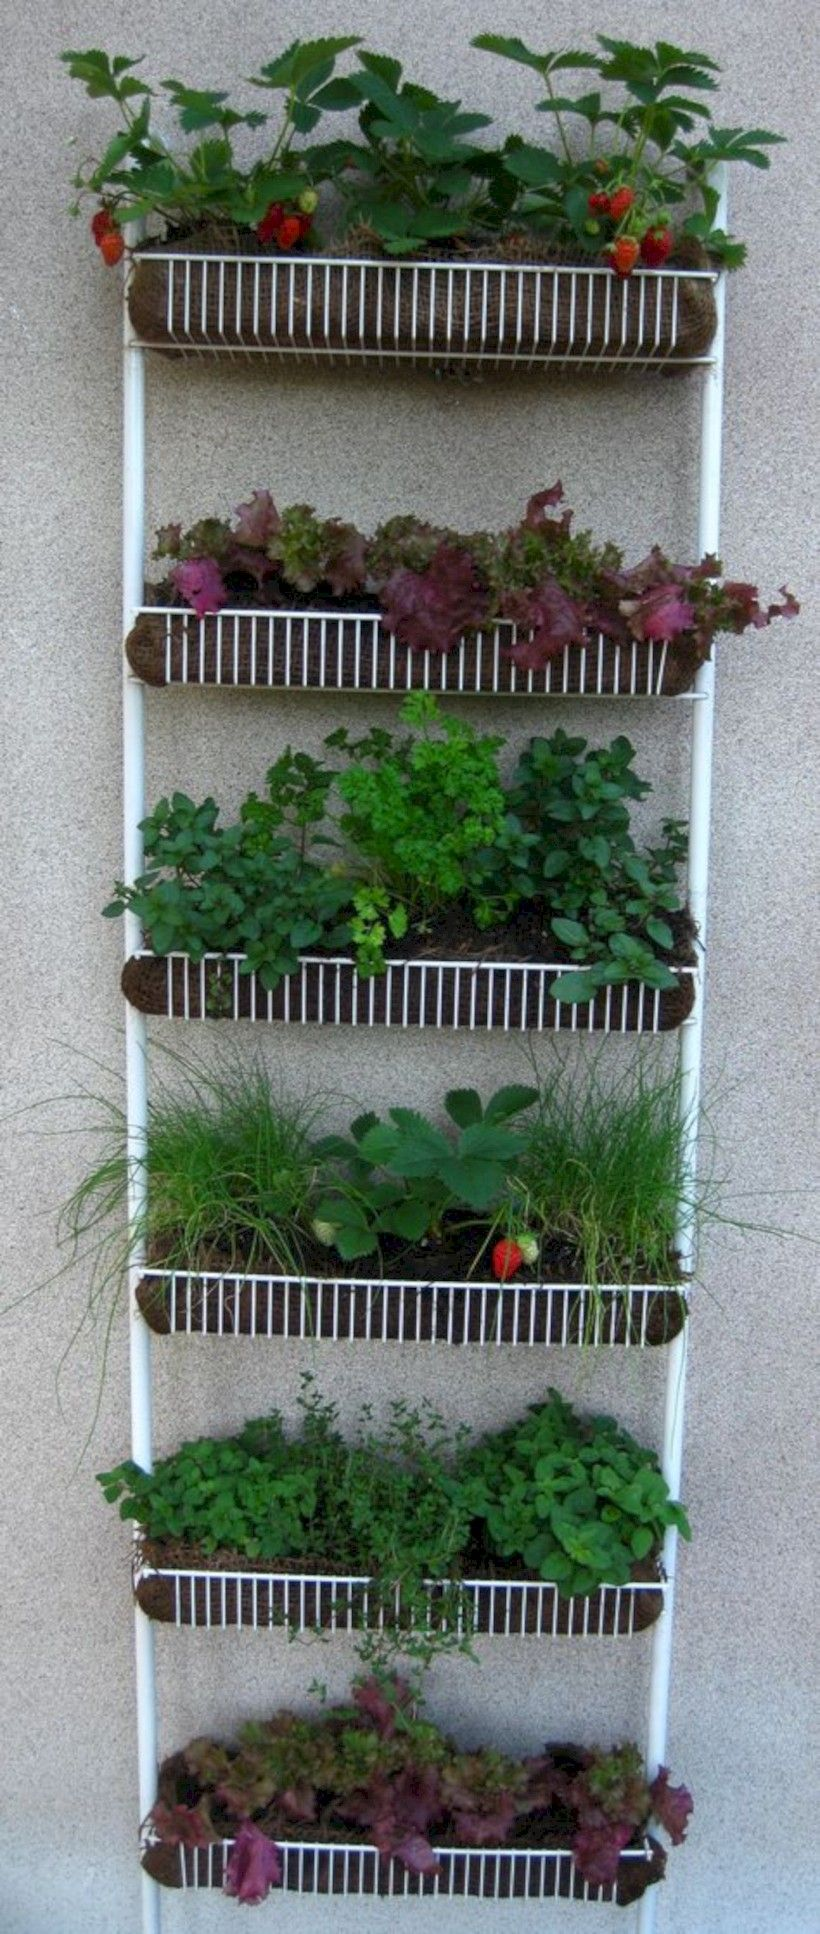 50+ Inspiring Ideas Vertical Vegetable Garden Designs ...